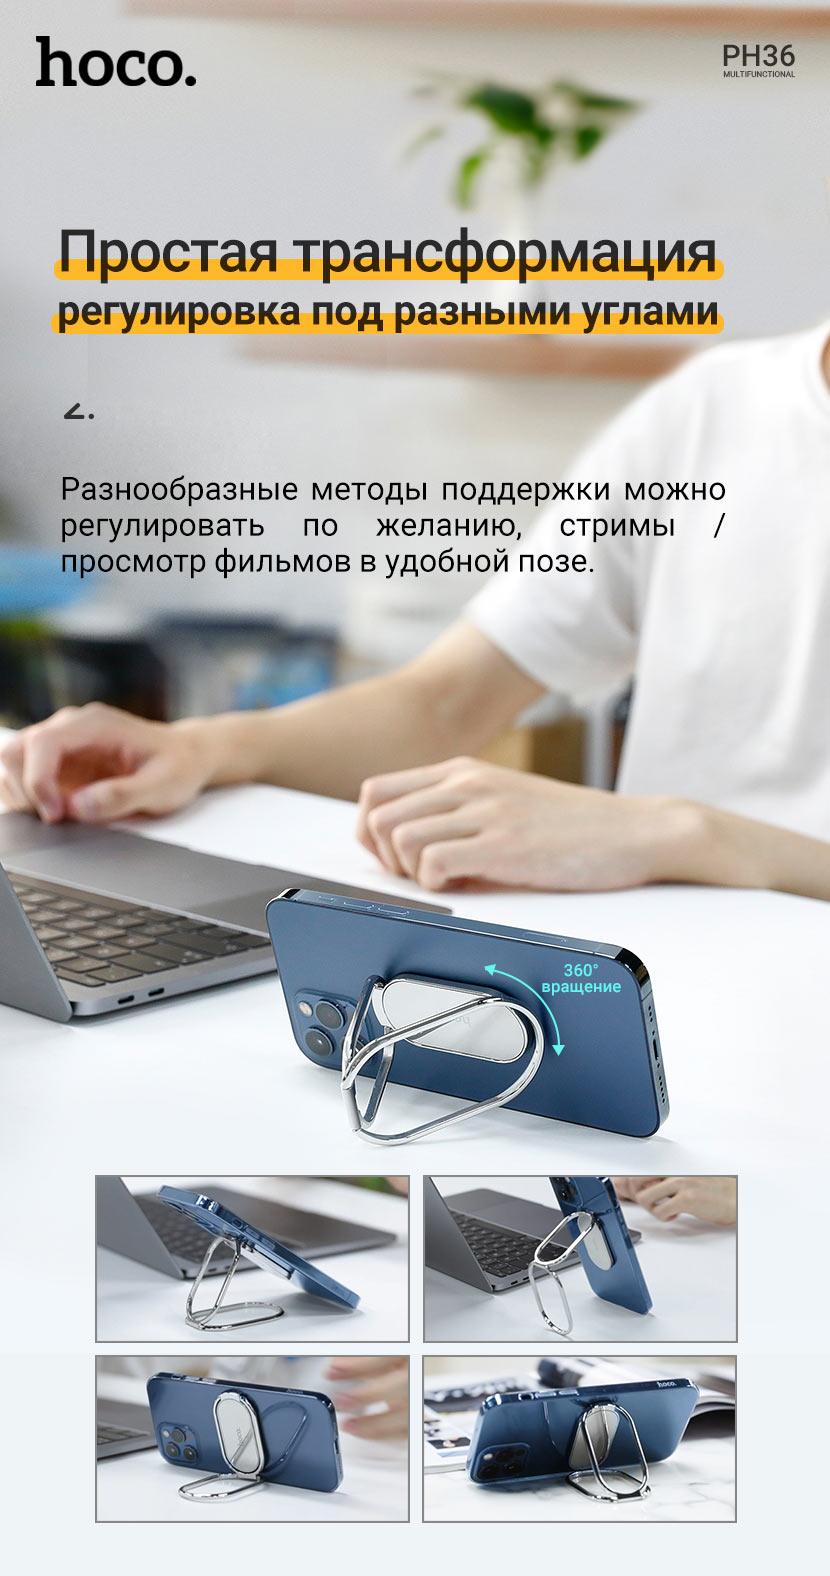 hoco news ph36 emma metal multifunctional folding stand transformation ru